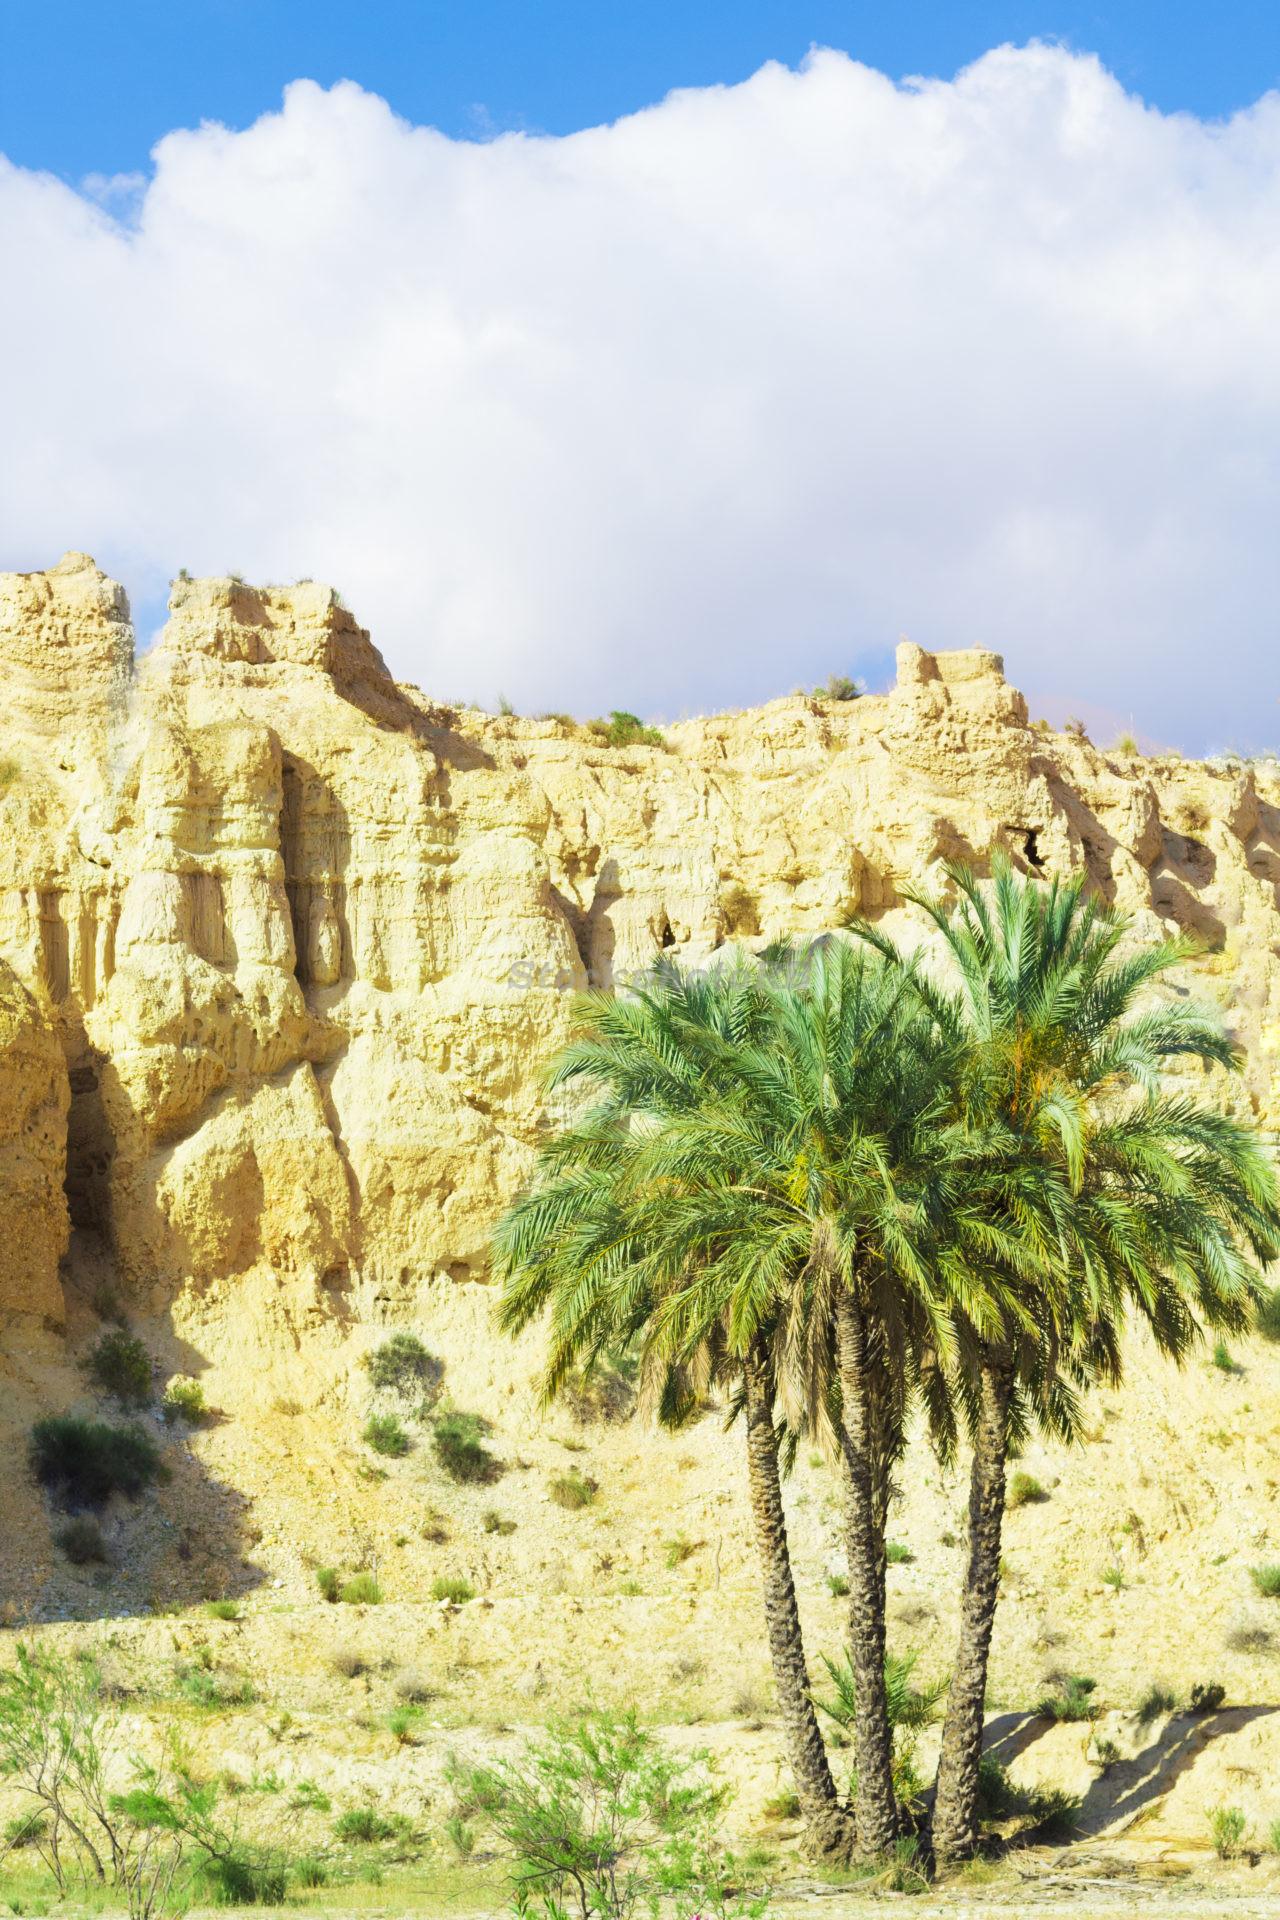 Palms and rocks